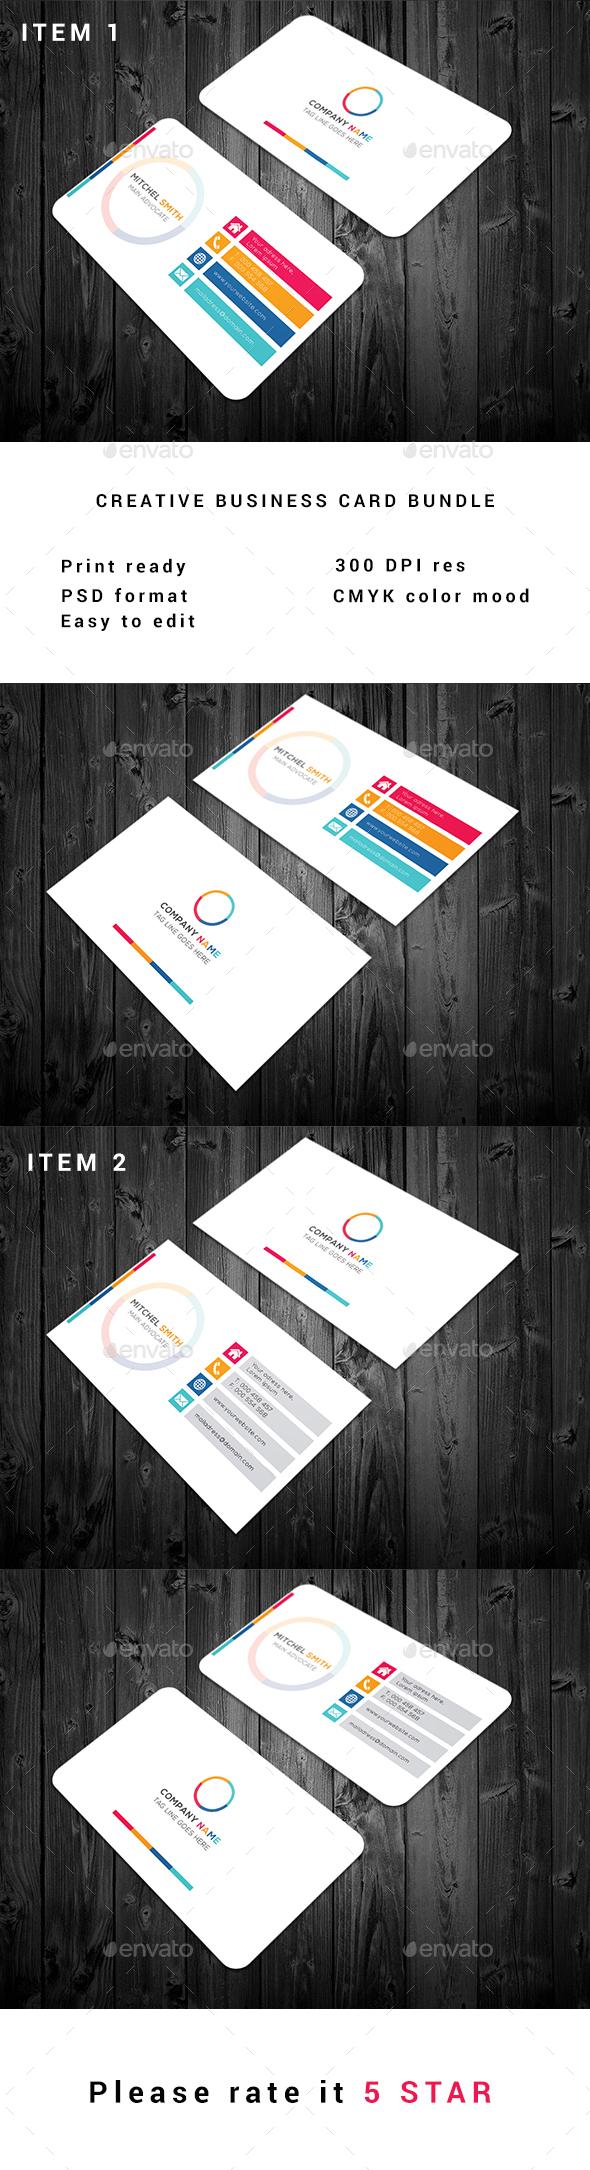 Business Cards Bundle Graphics, Designs & Templates (Page 9)